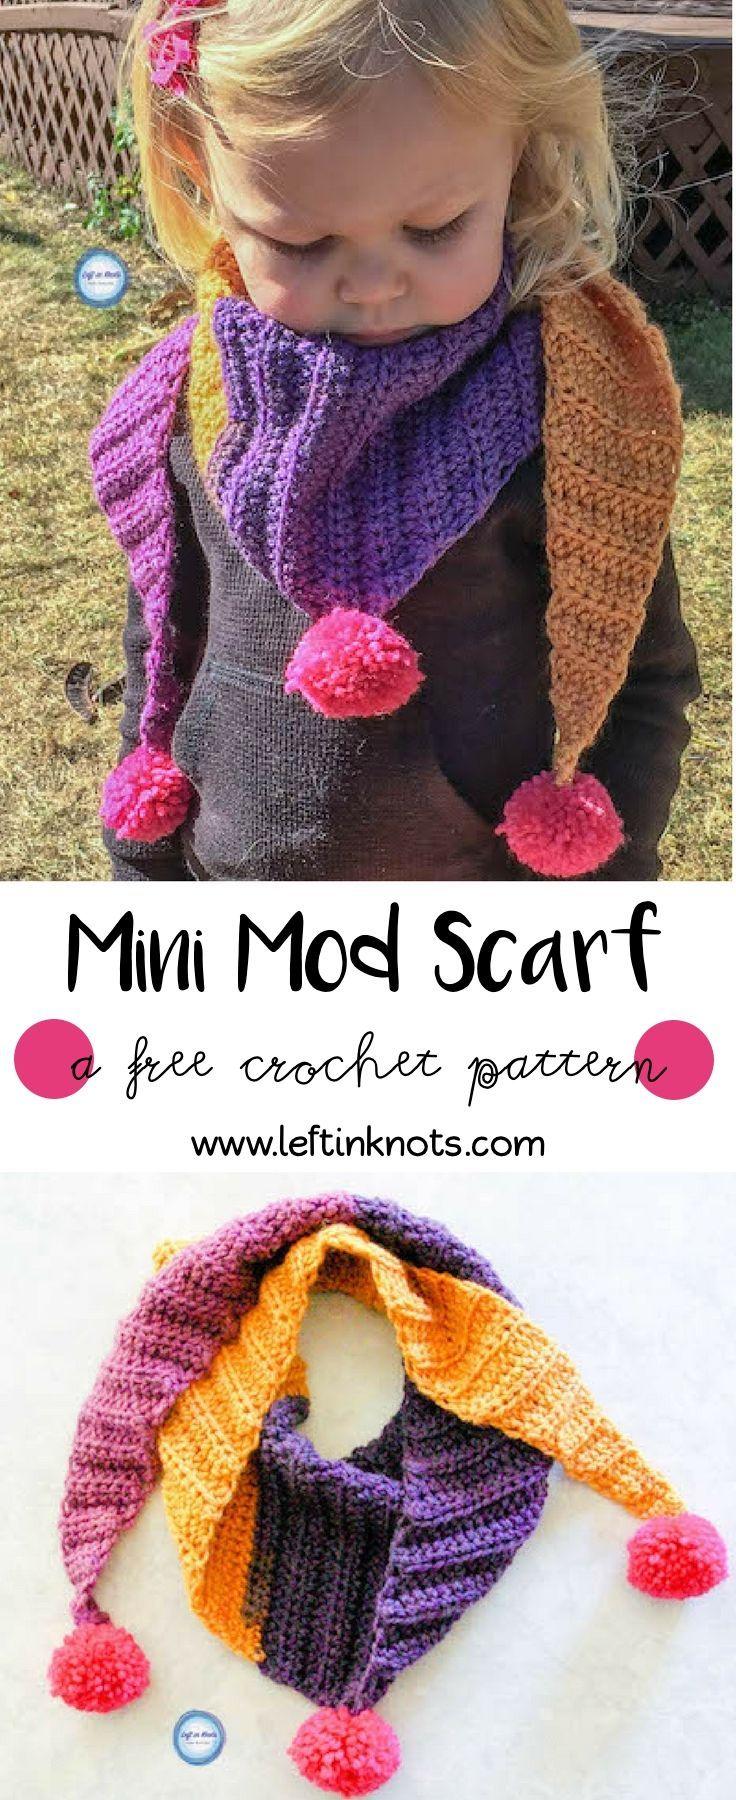 Mini Mod Scarf - Free Crochet Pattern | Gorros, Patrón de ganchillo ...